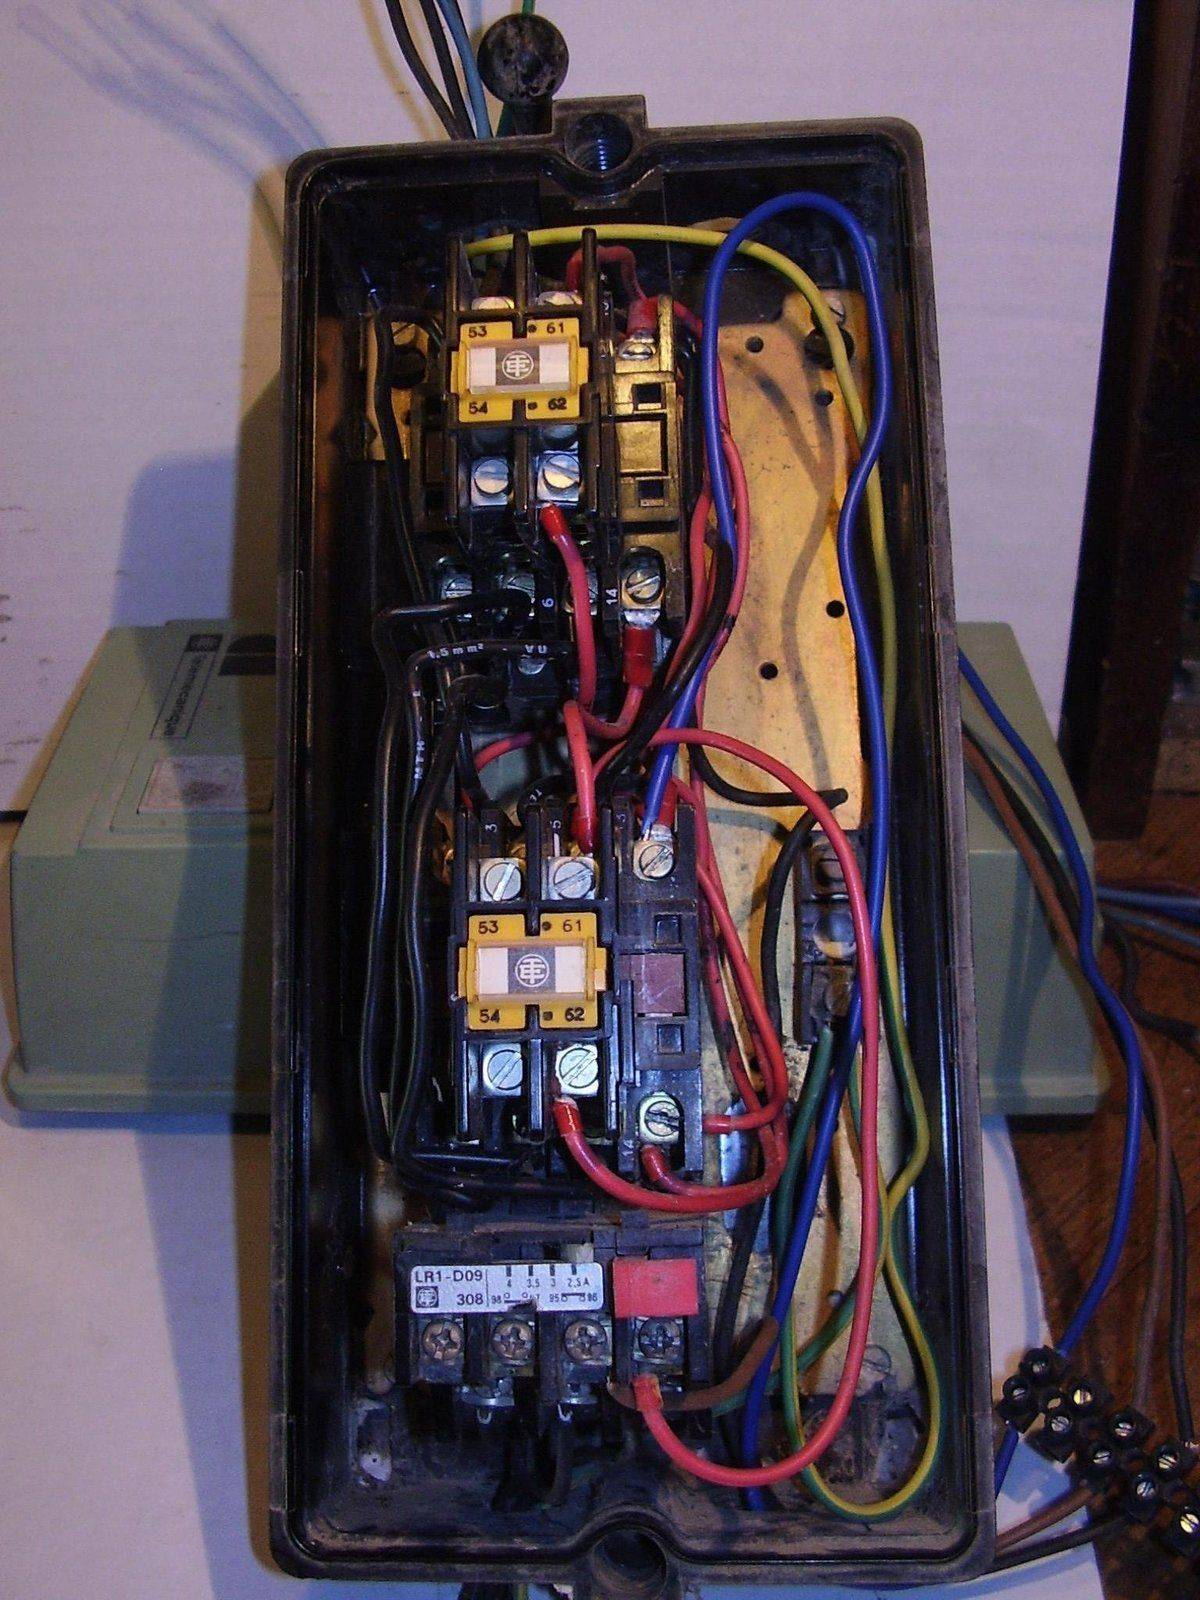 PC120160.JPG